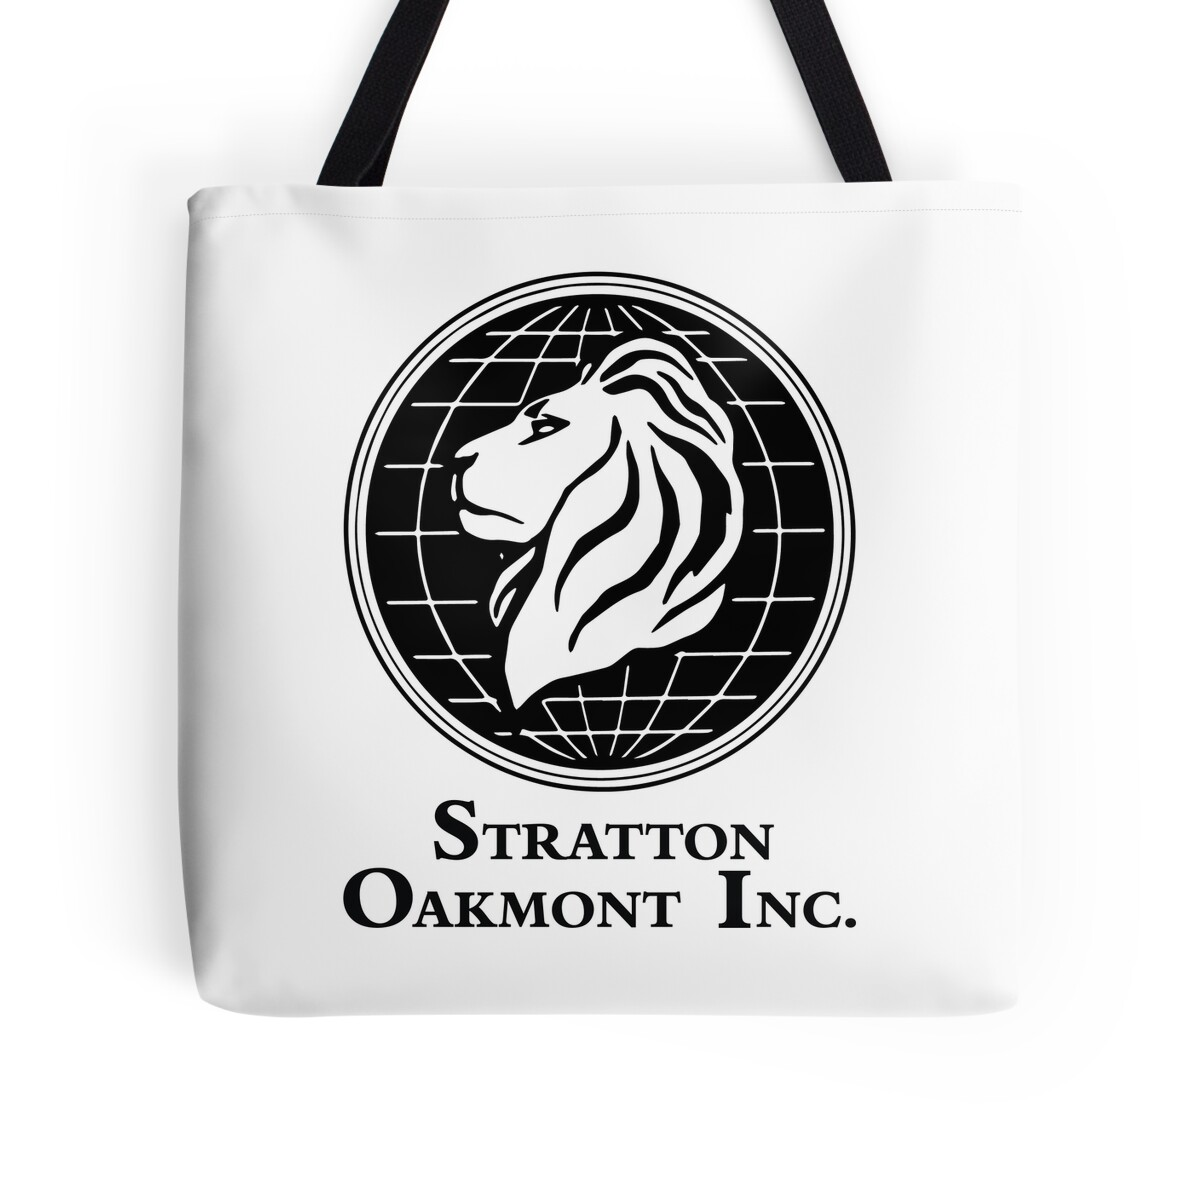 Stratton Oakmont The Image Kid Has It